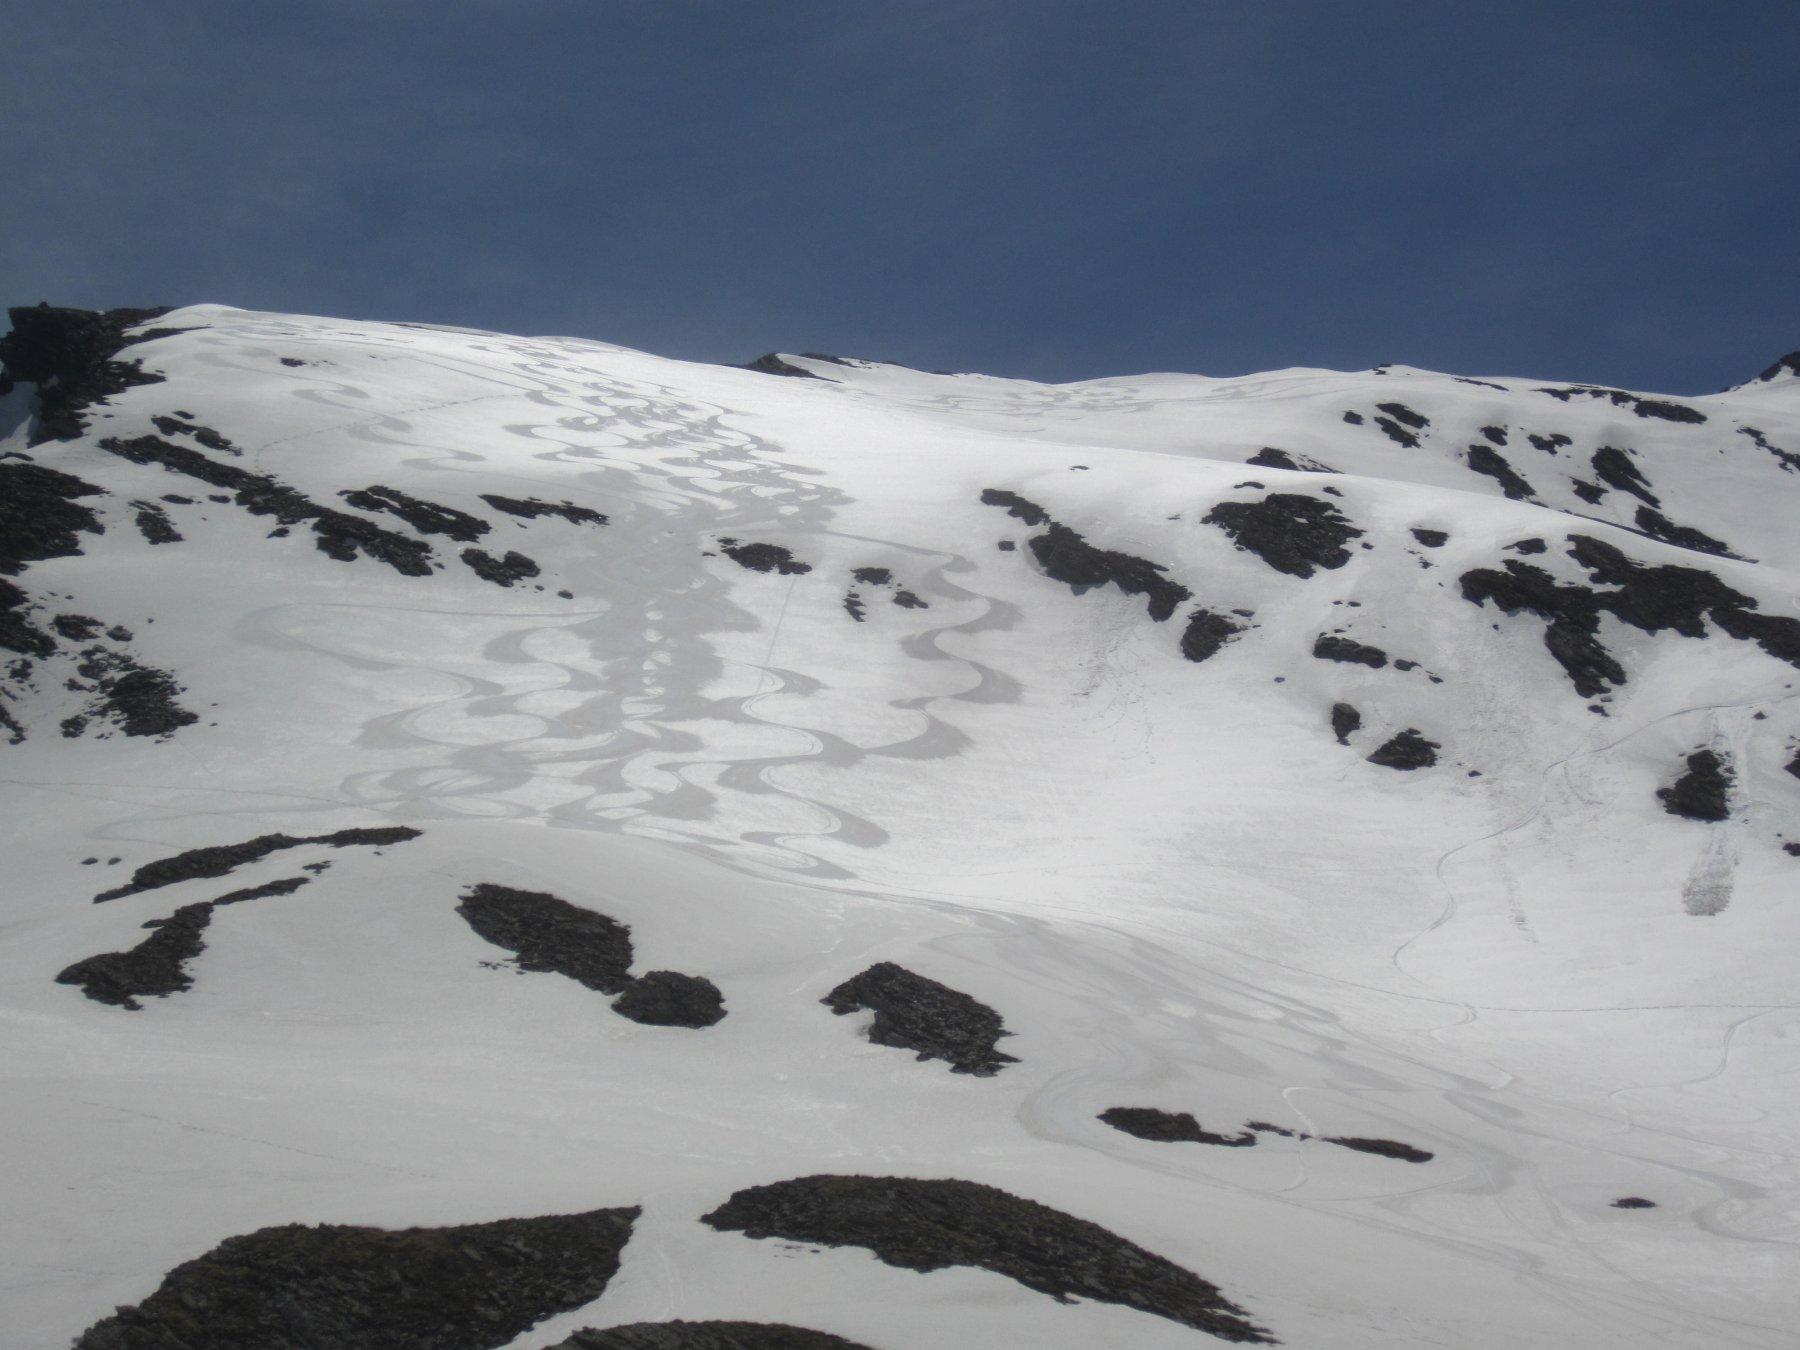 Roudel (Cima) dalla Valle Argentera per la Valle Lunga 2020-05-25